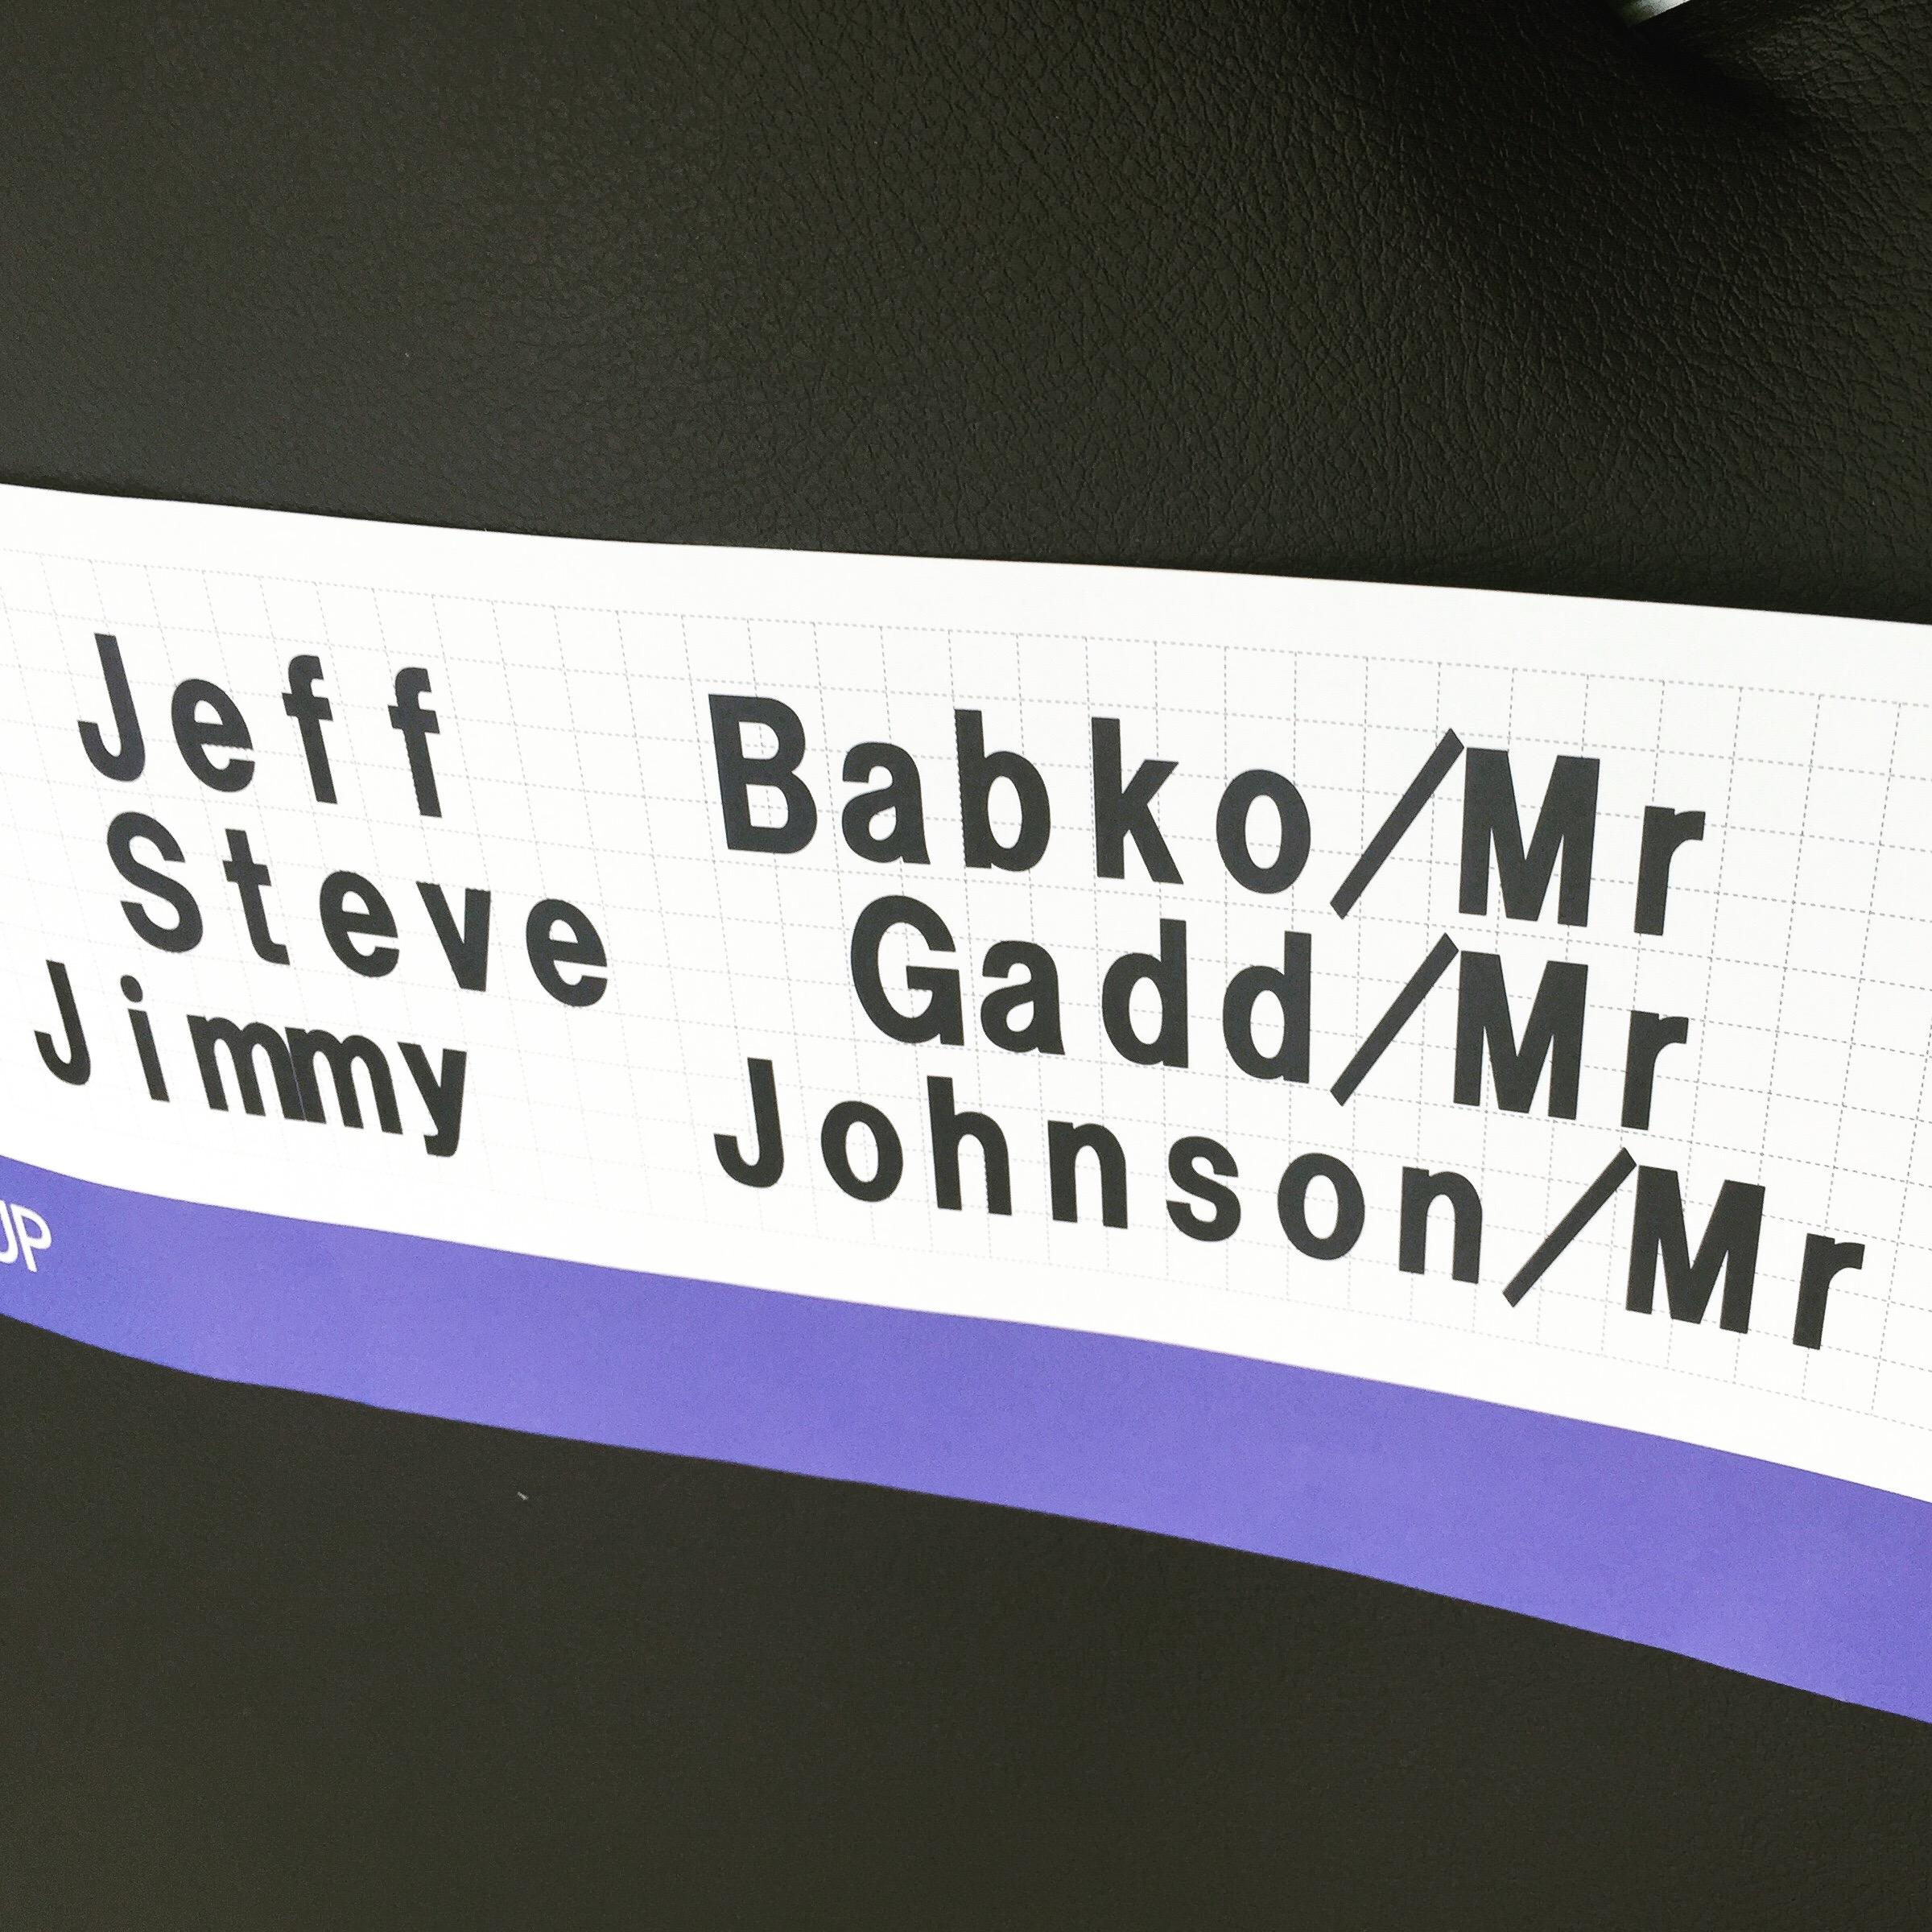 ah, but first billing here! dream trio. Babko/Gadd/Johnson (as if)- James Taylor trip to Japan for Seiji Ozawa's 80th.